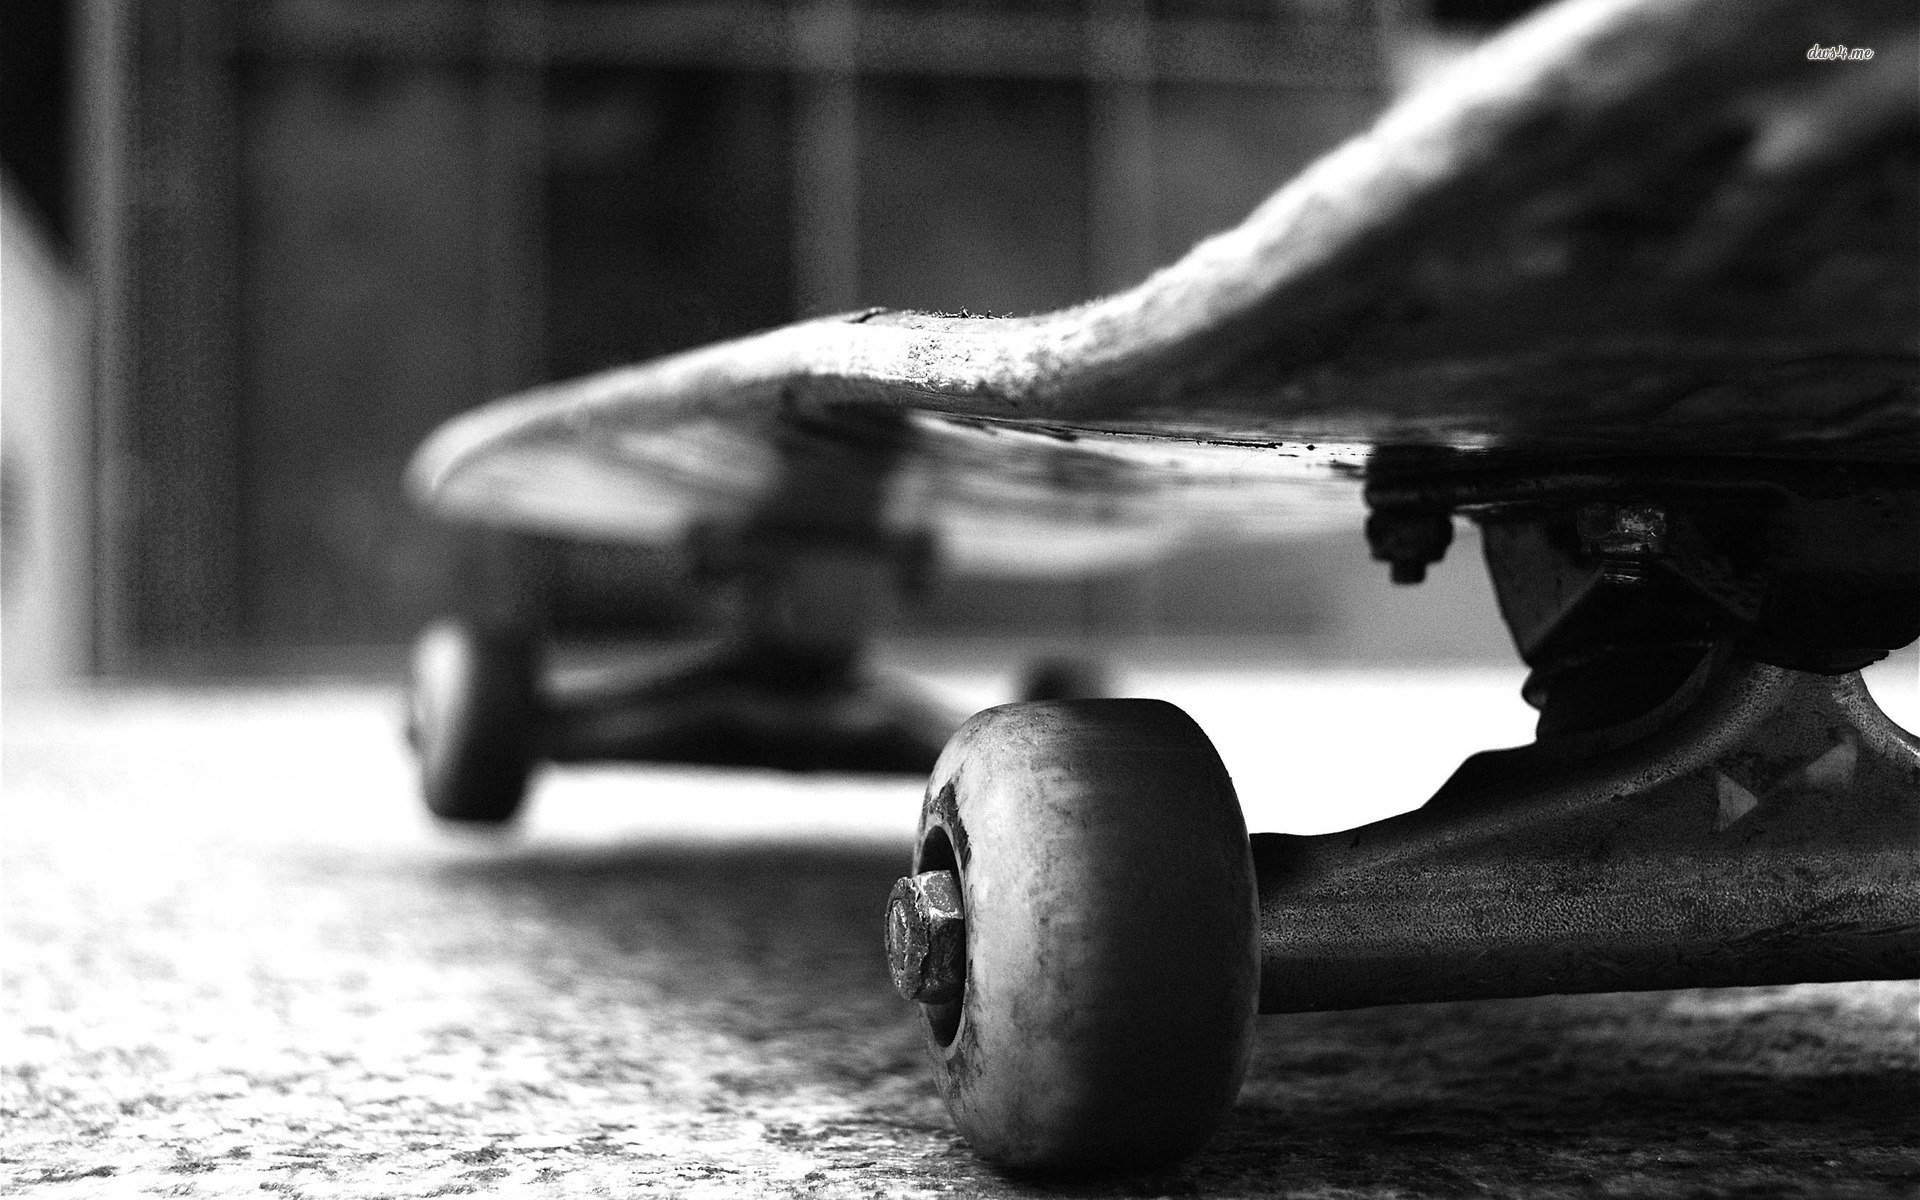 Skateboard wallpaper   Photography wallpapers   7362 1920x1200